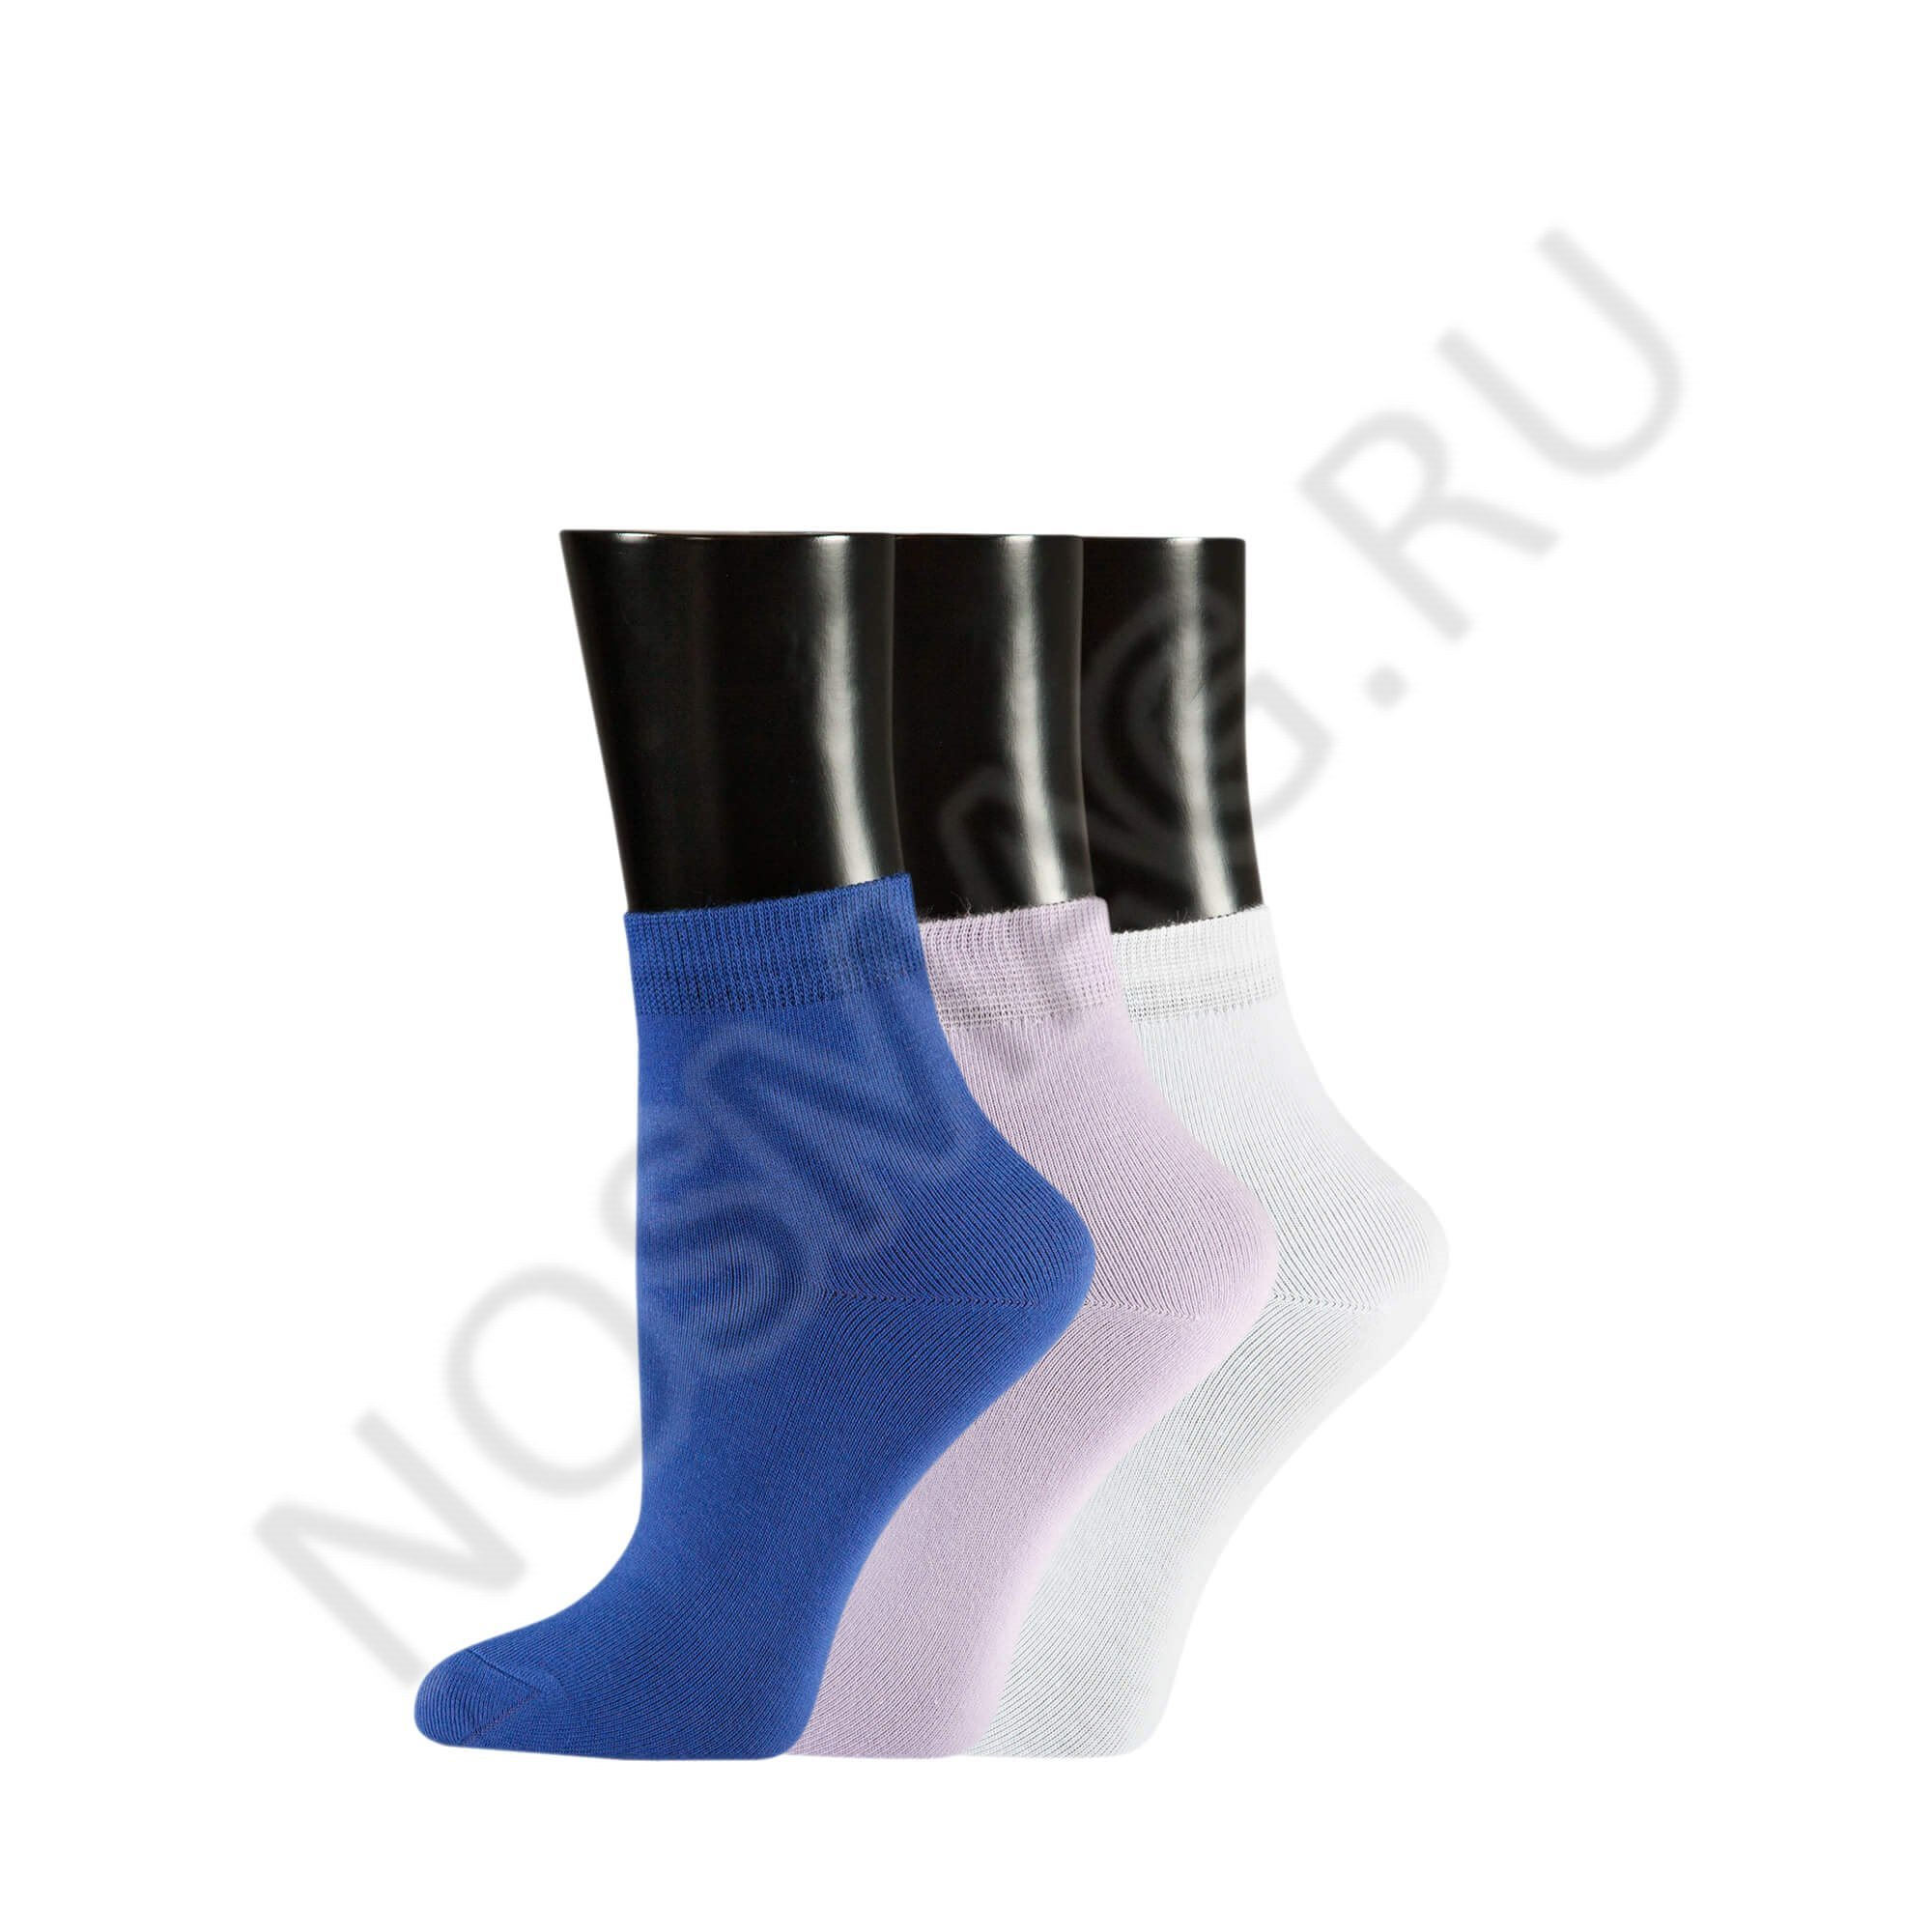 Комплект женских носков Teller Optima из 3 пар